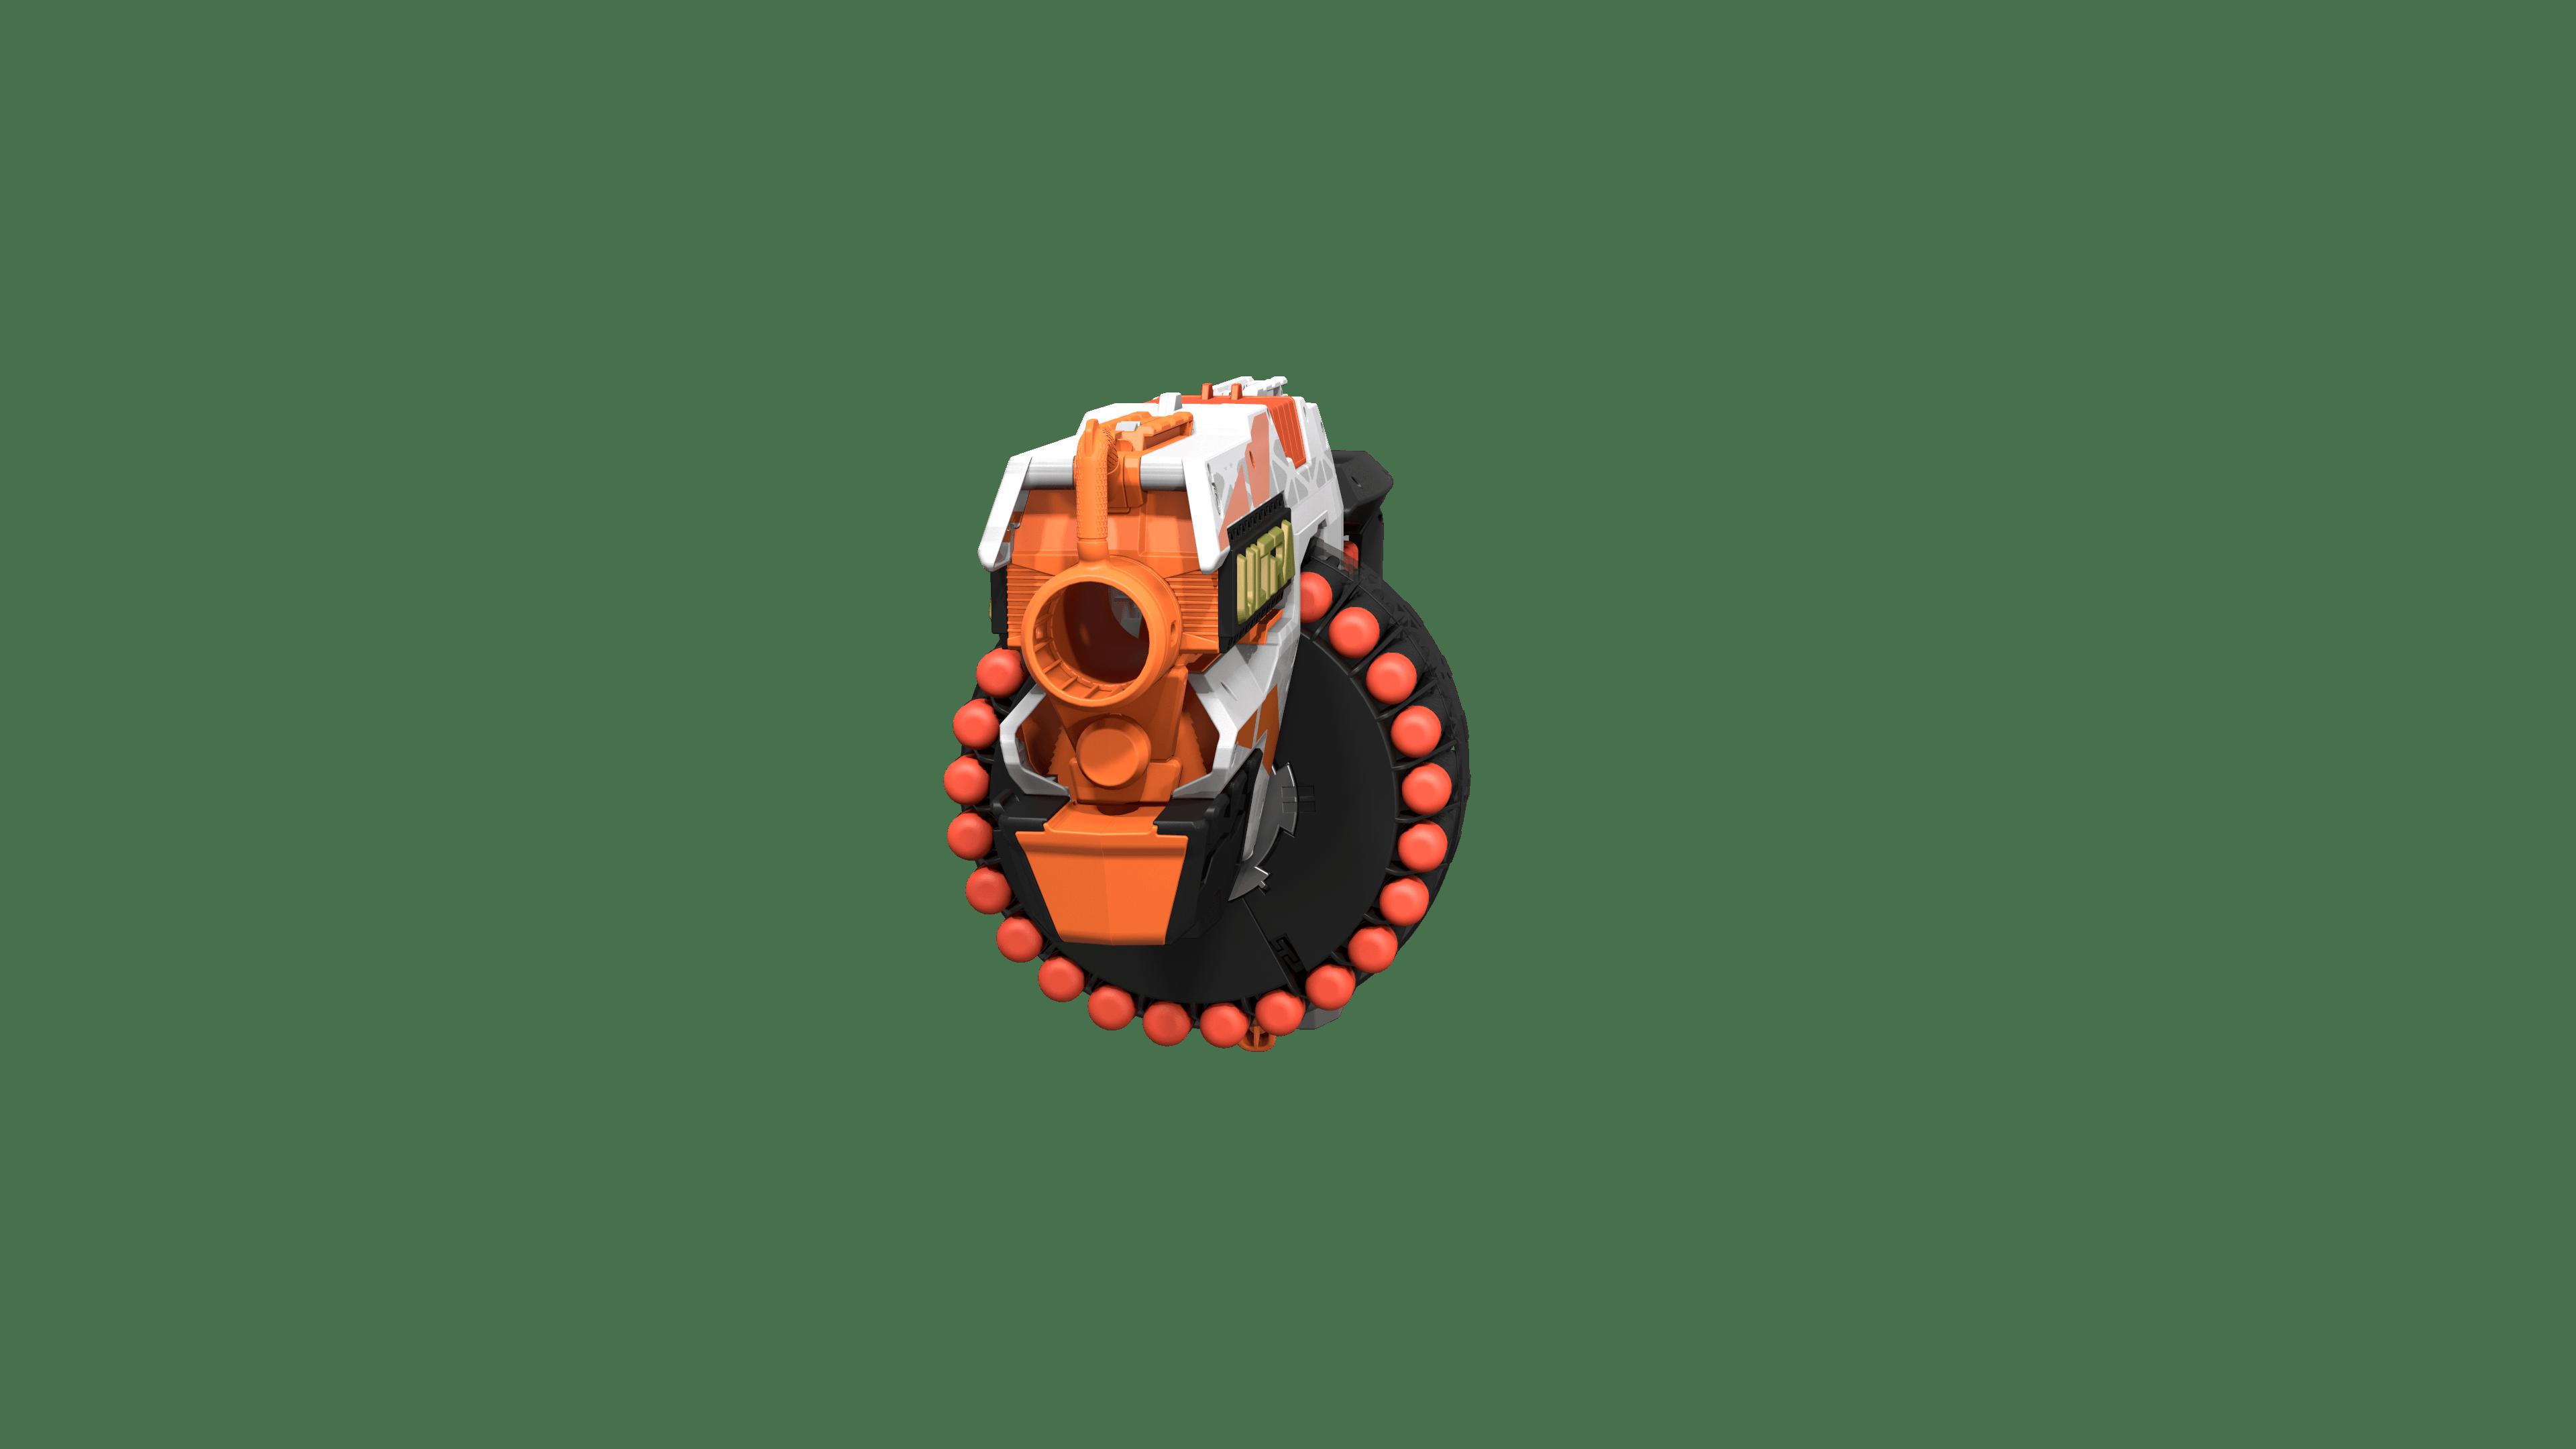 ultra blaster img 90